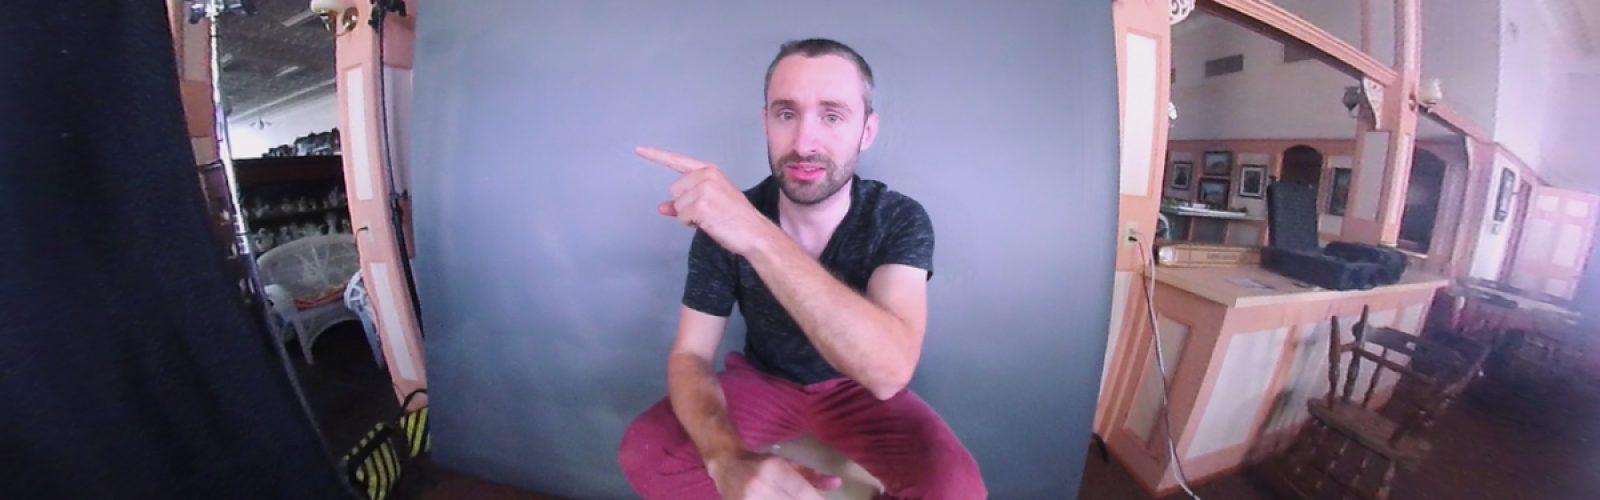 360-video-post